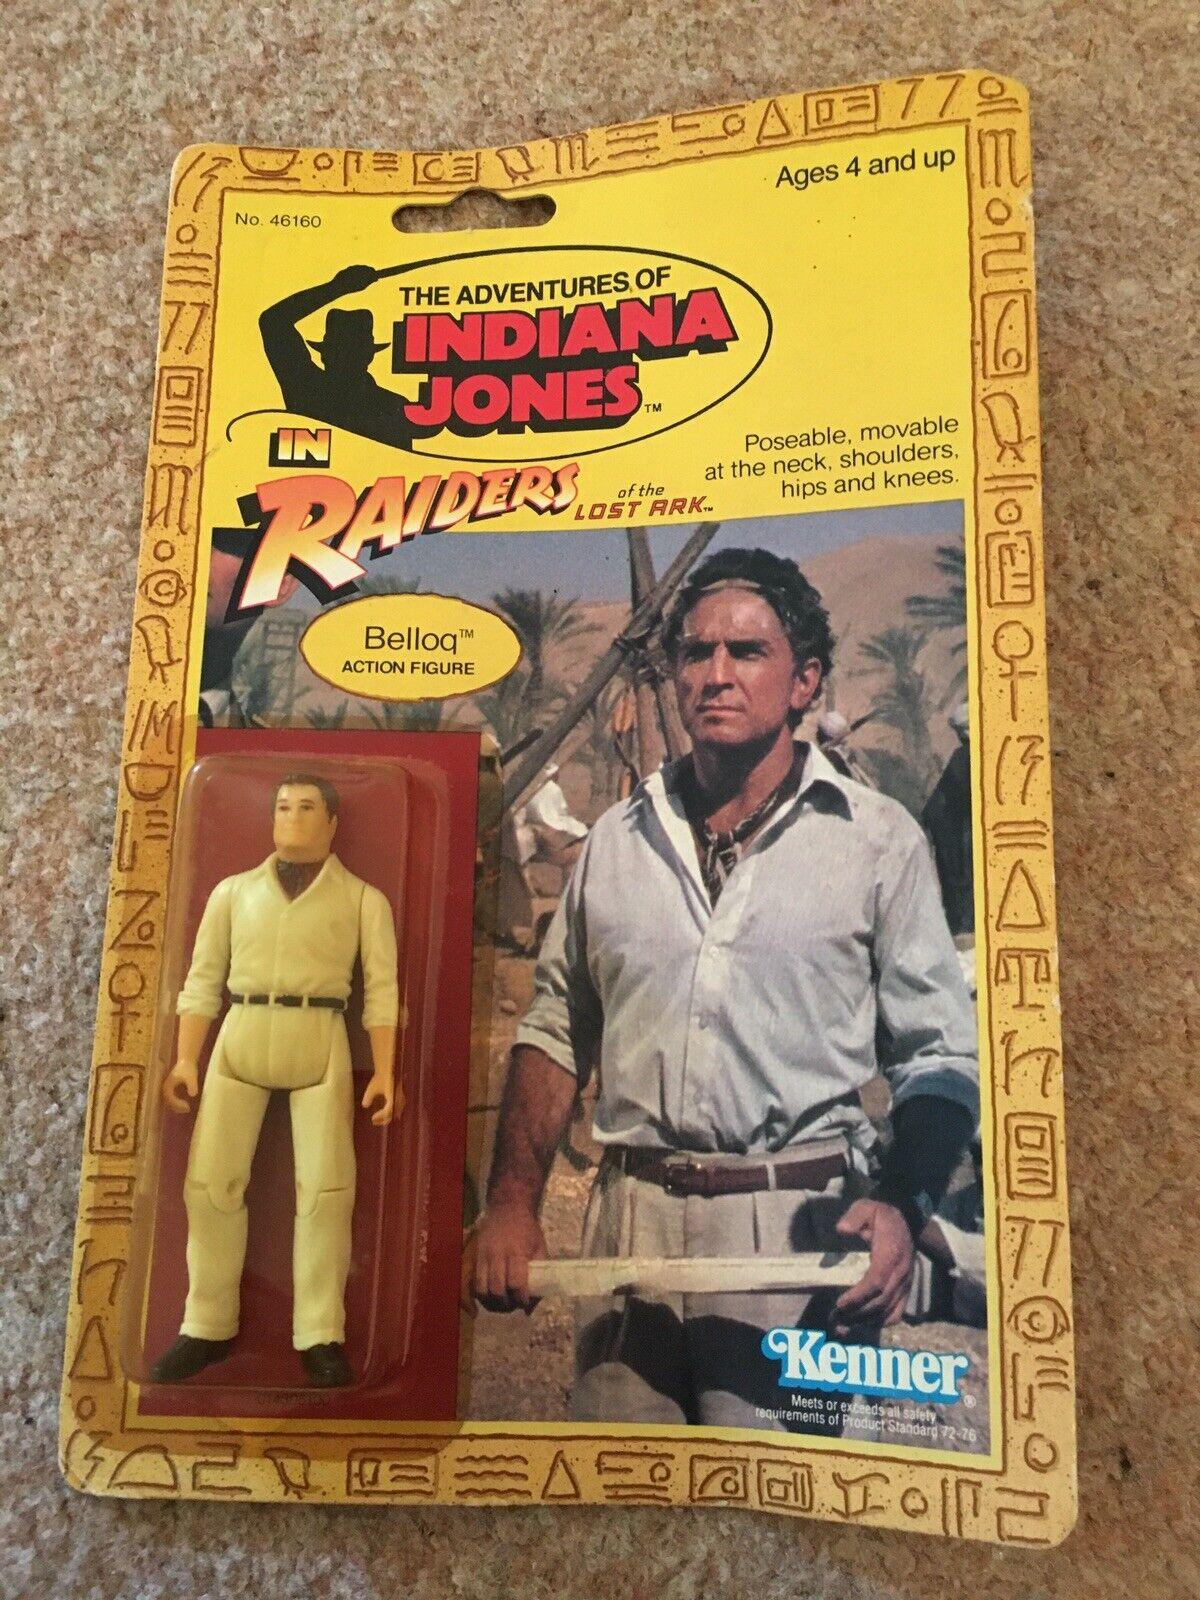 Indiana Jones Belloq Figur Raiders of the Lost Ark Kenner 1982 Vintage 9 Back